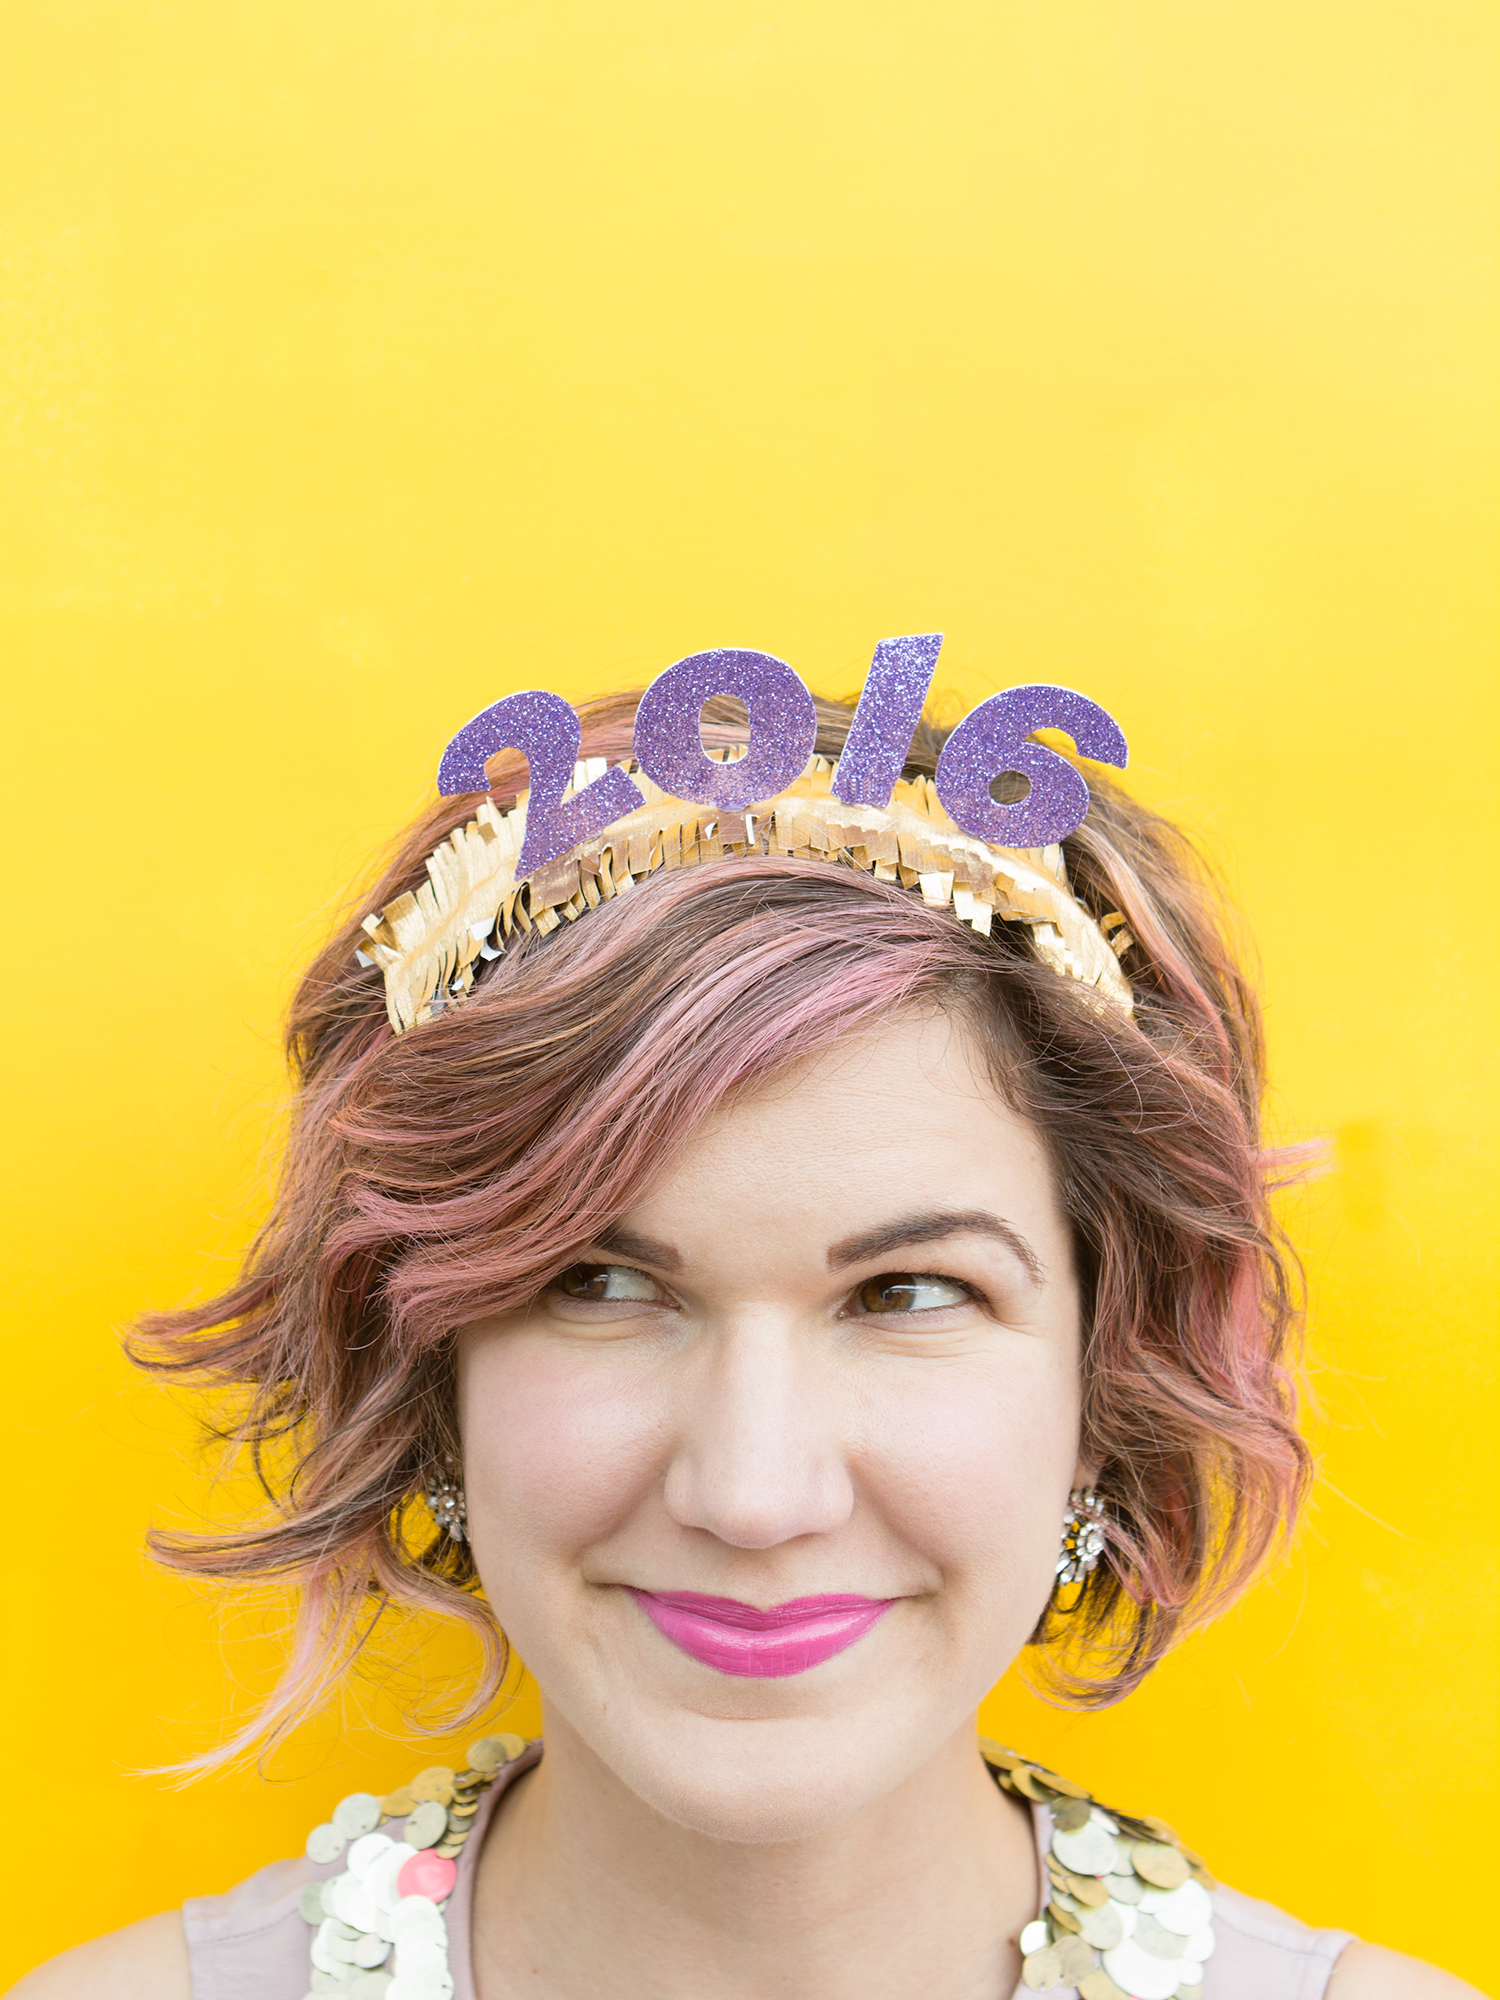 Glittery New Year's Headbands